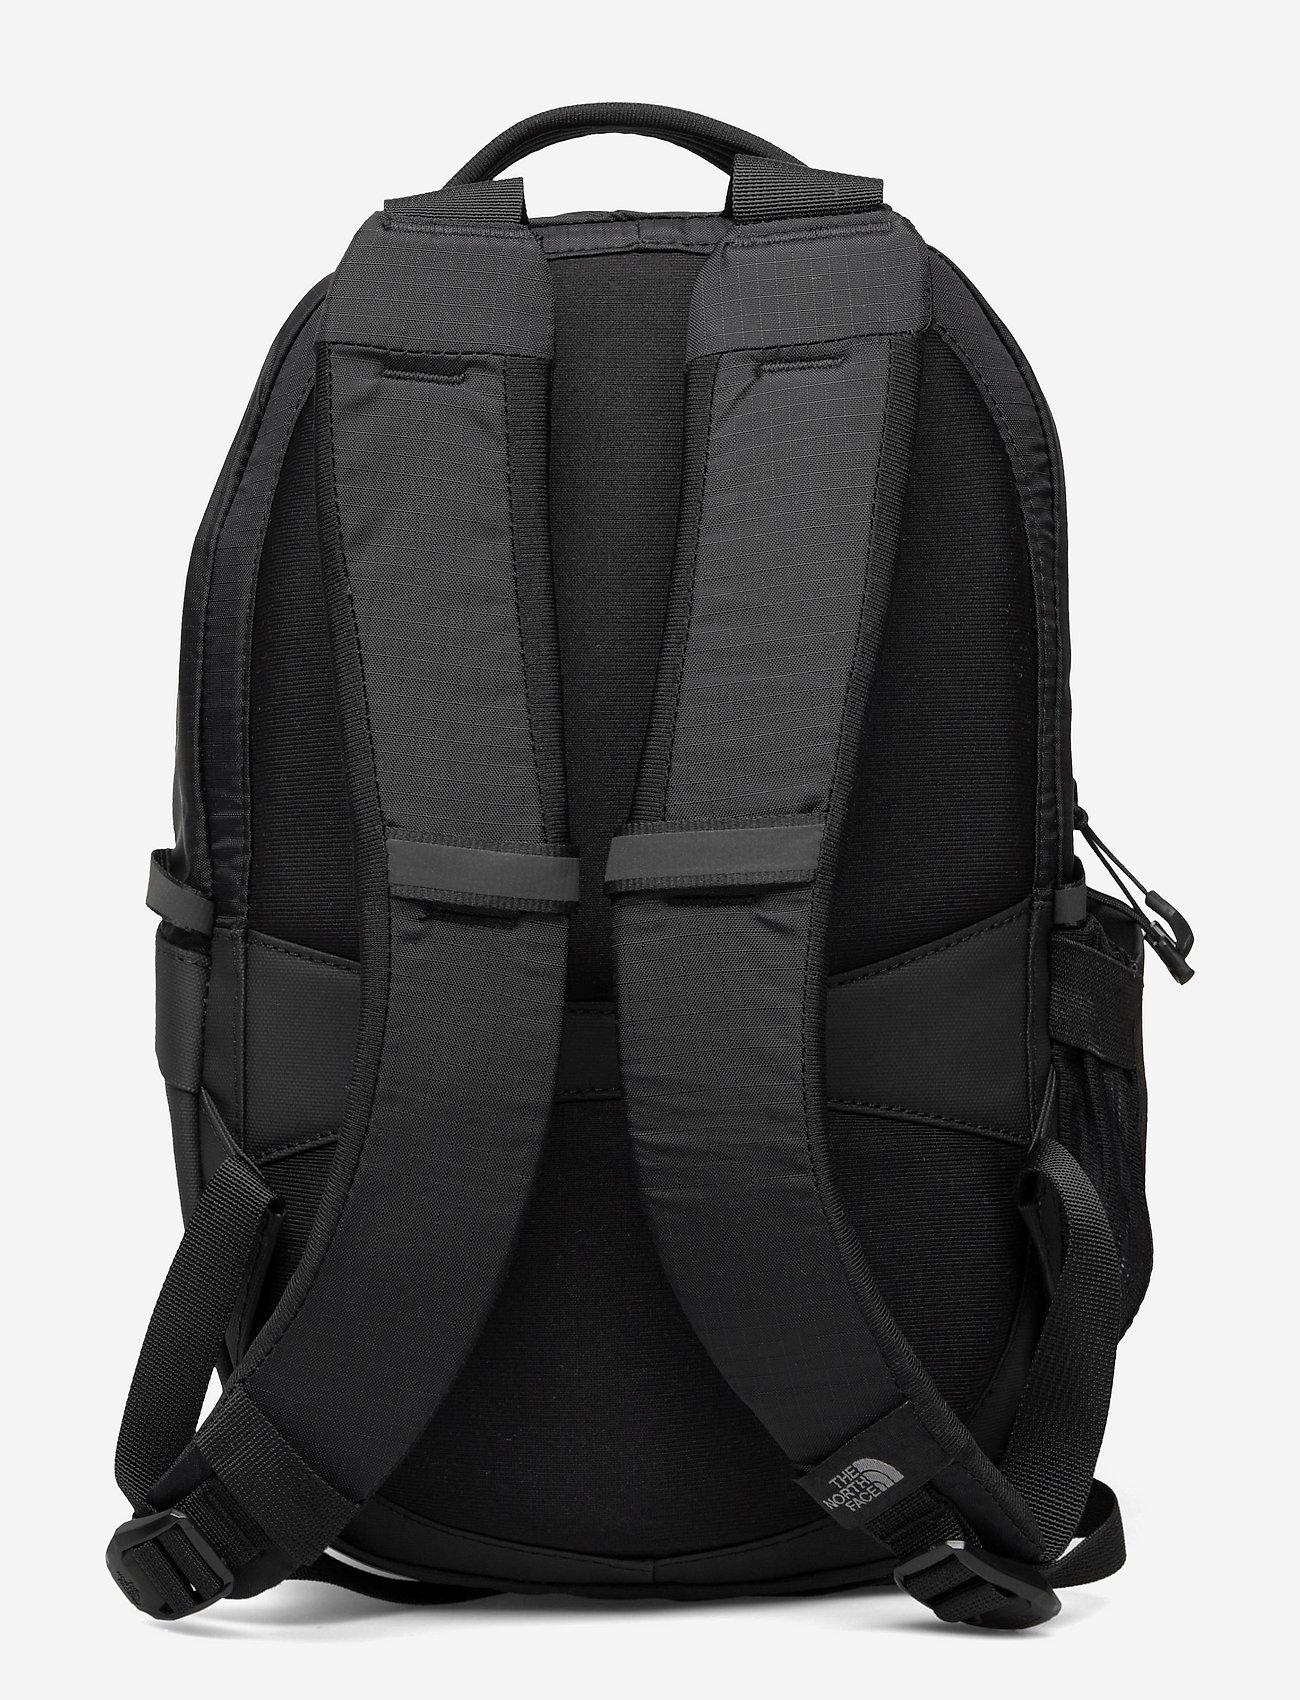 The North Face - BOREALIS MINI - sacs a dos - tnf black-tnf black - 1